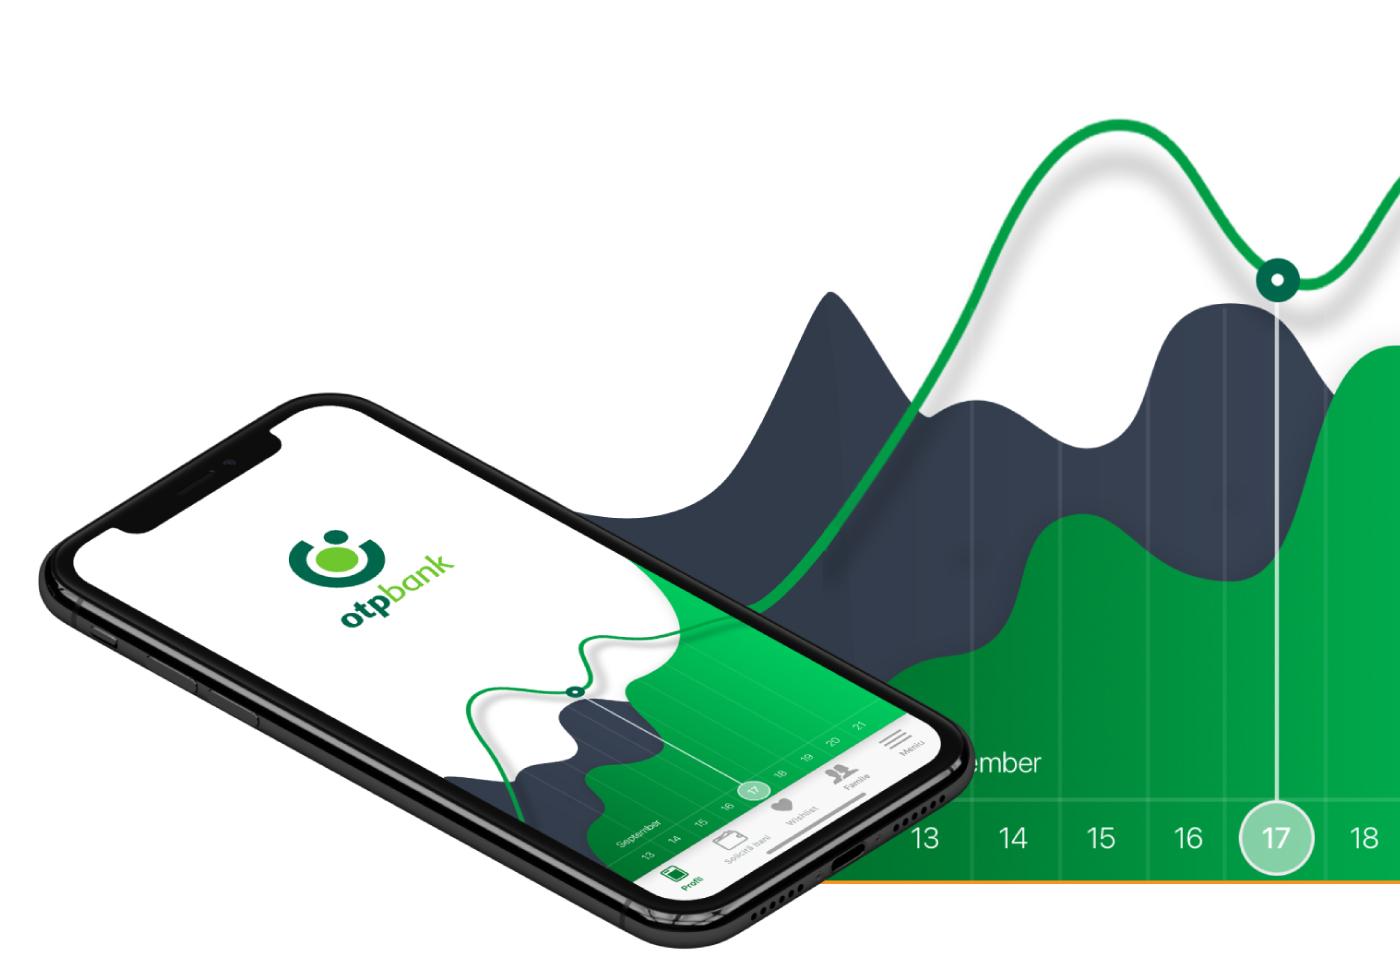 OTP Bank - Financial education chart